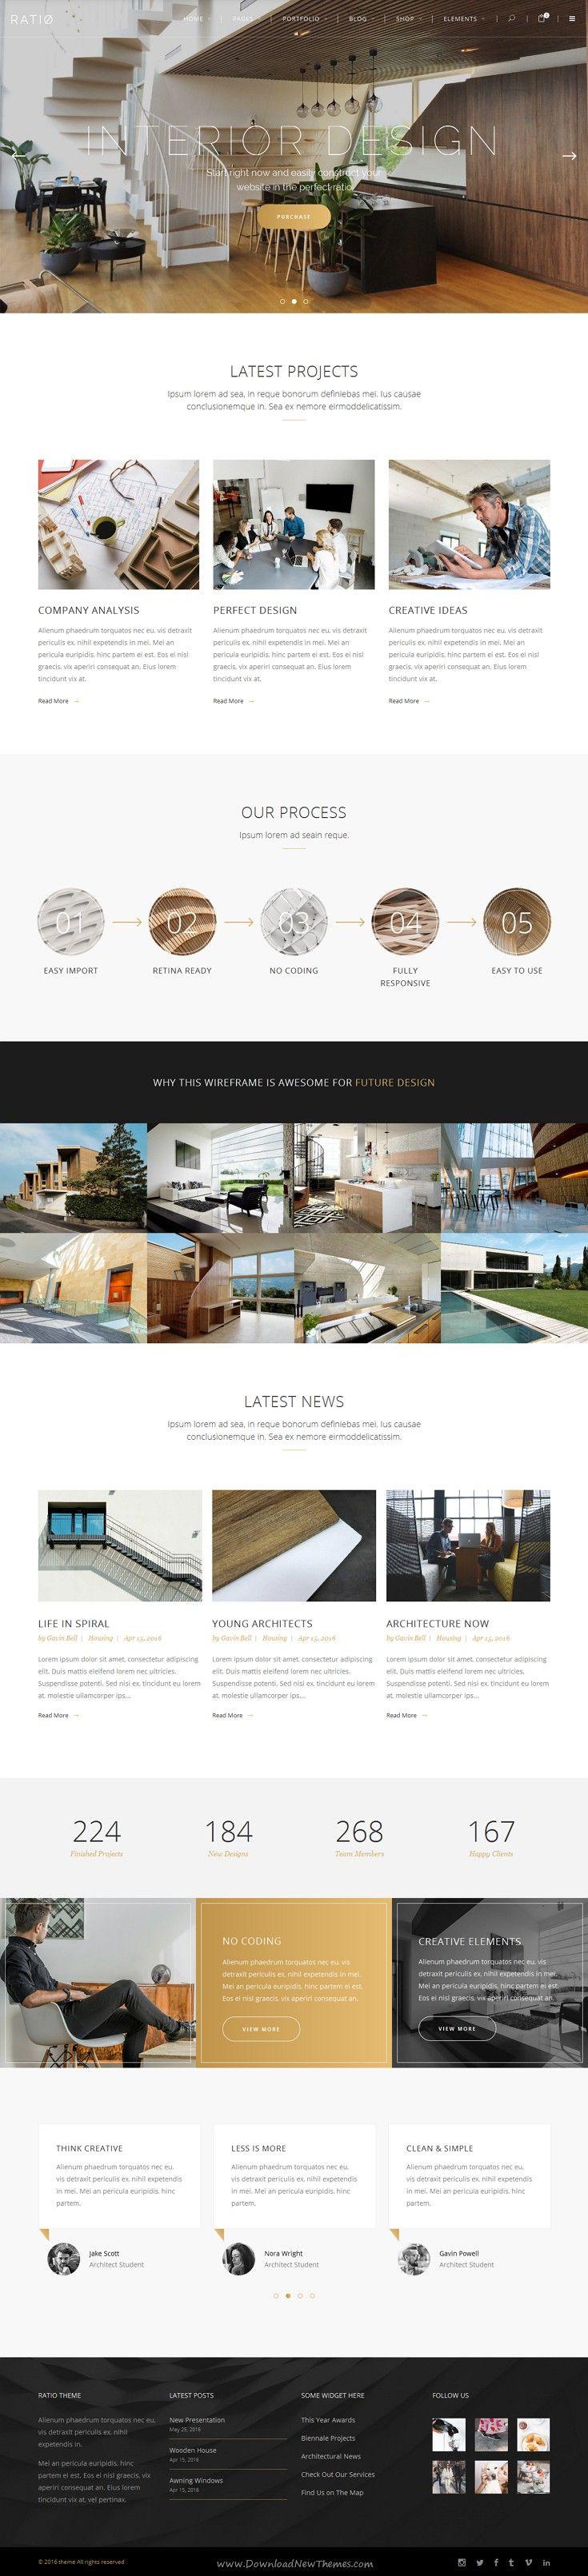 Best 25 Interior Design Websites Ideas On Pinterest